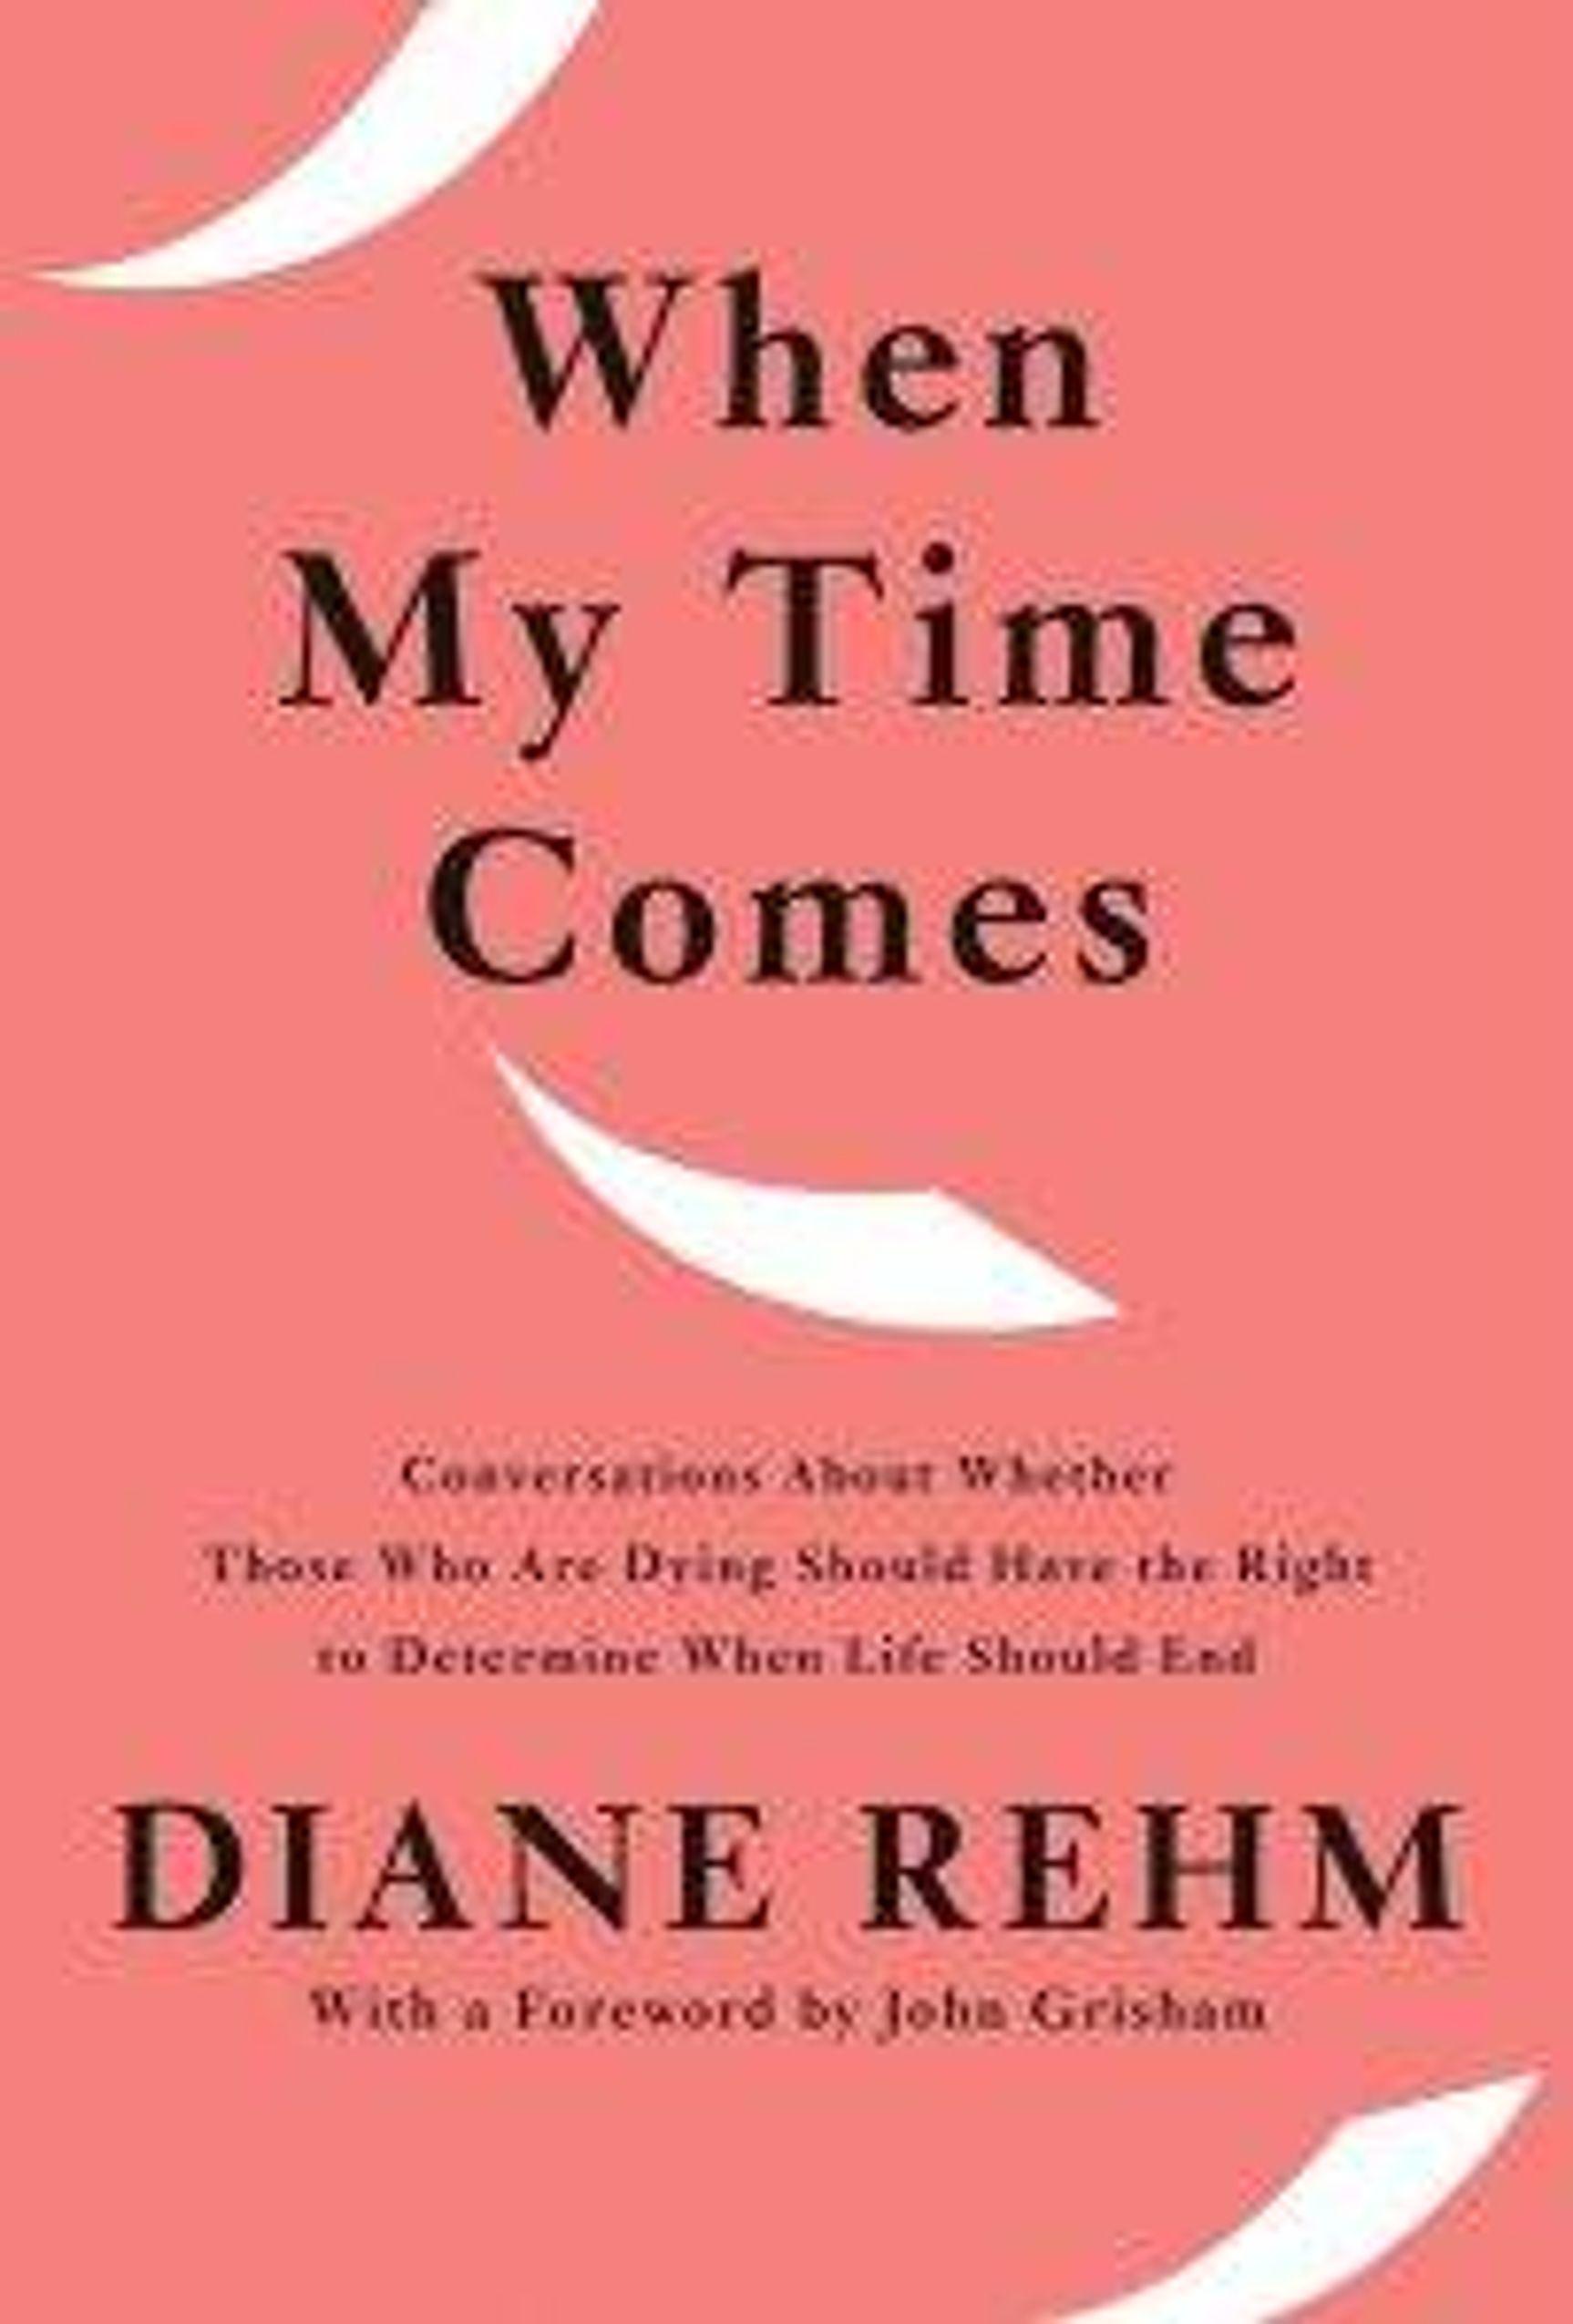 Diane Rehm's book